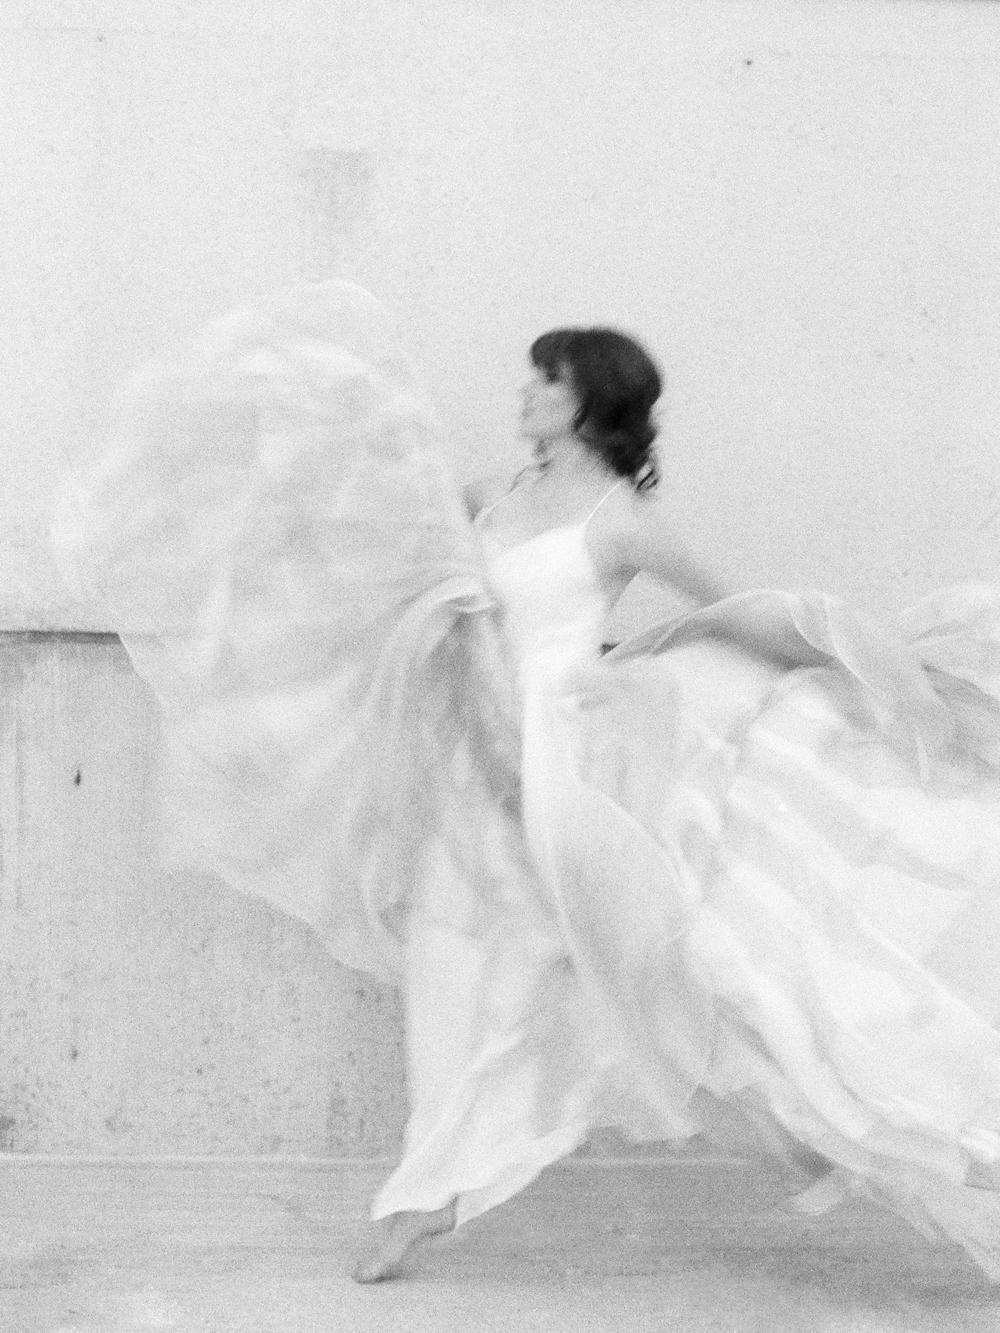 Christine Gosch_Houston wedding photographer_film photographer_fine art bride_lovely bride_ Houston, Texas_Montrose wedding photographer_www.christinegosch.com-3.jpg